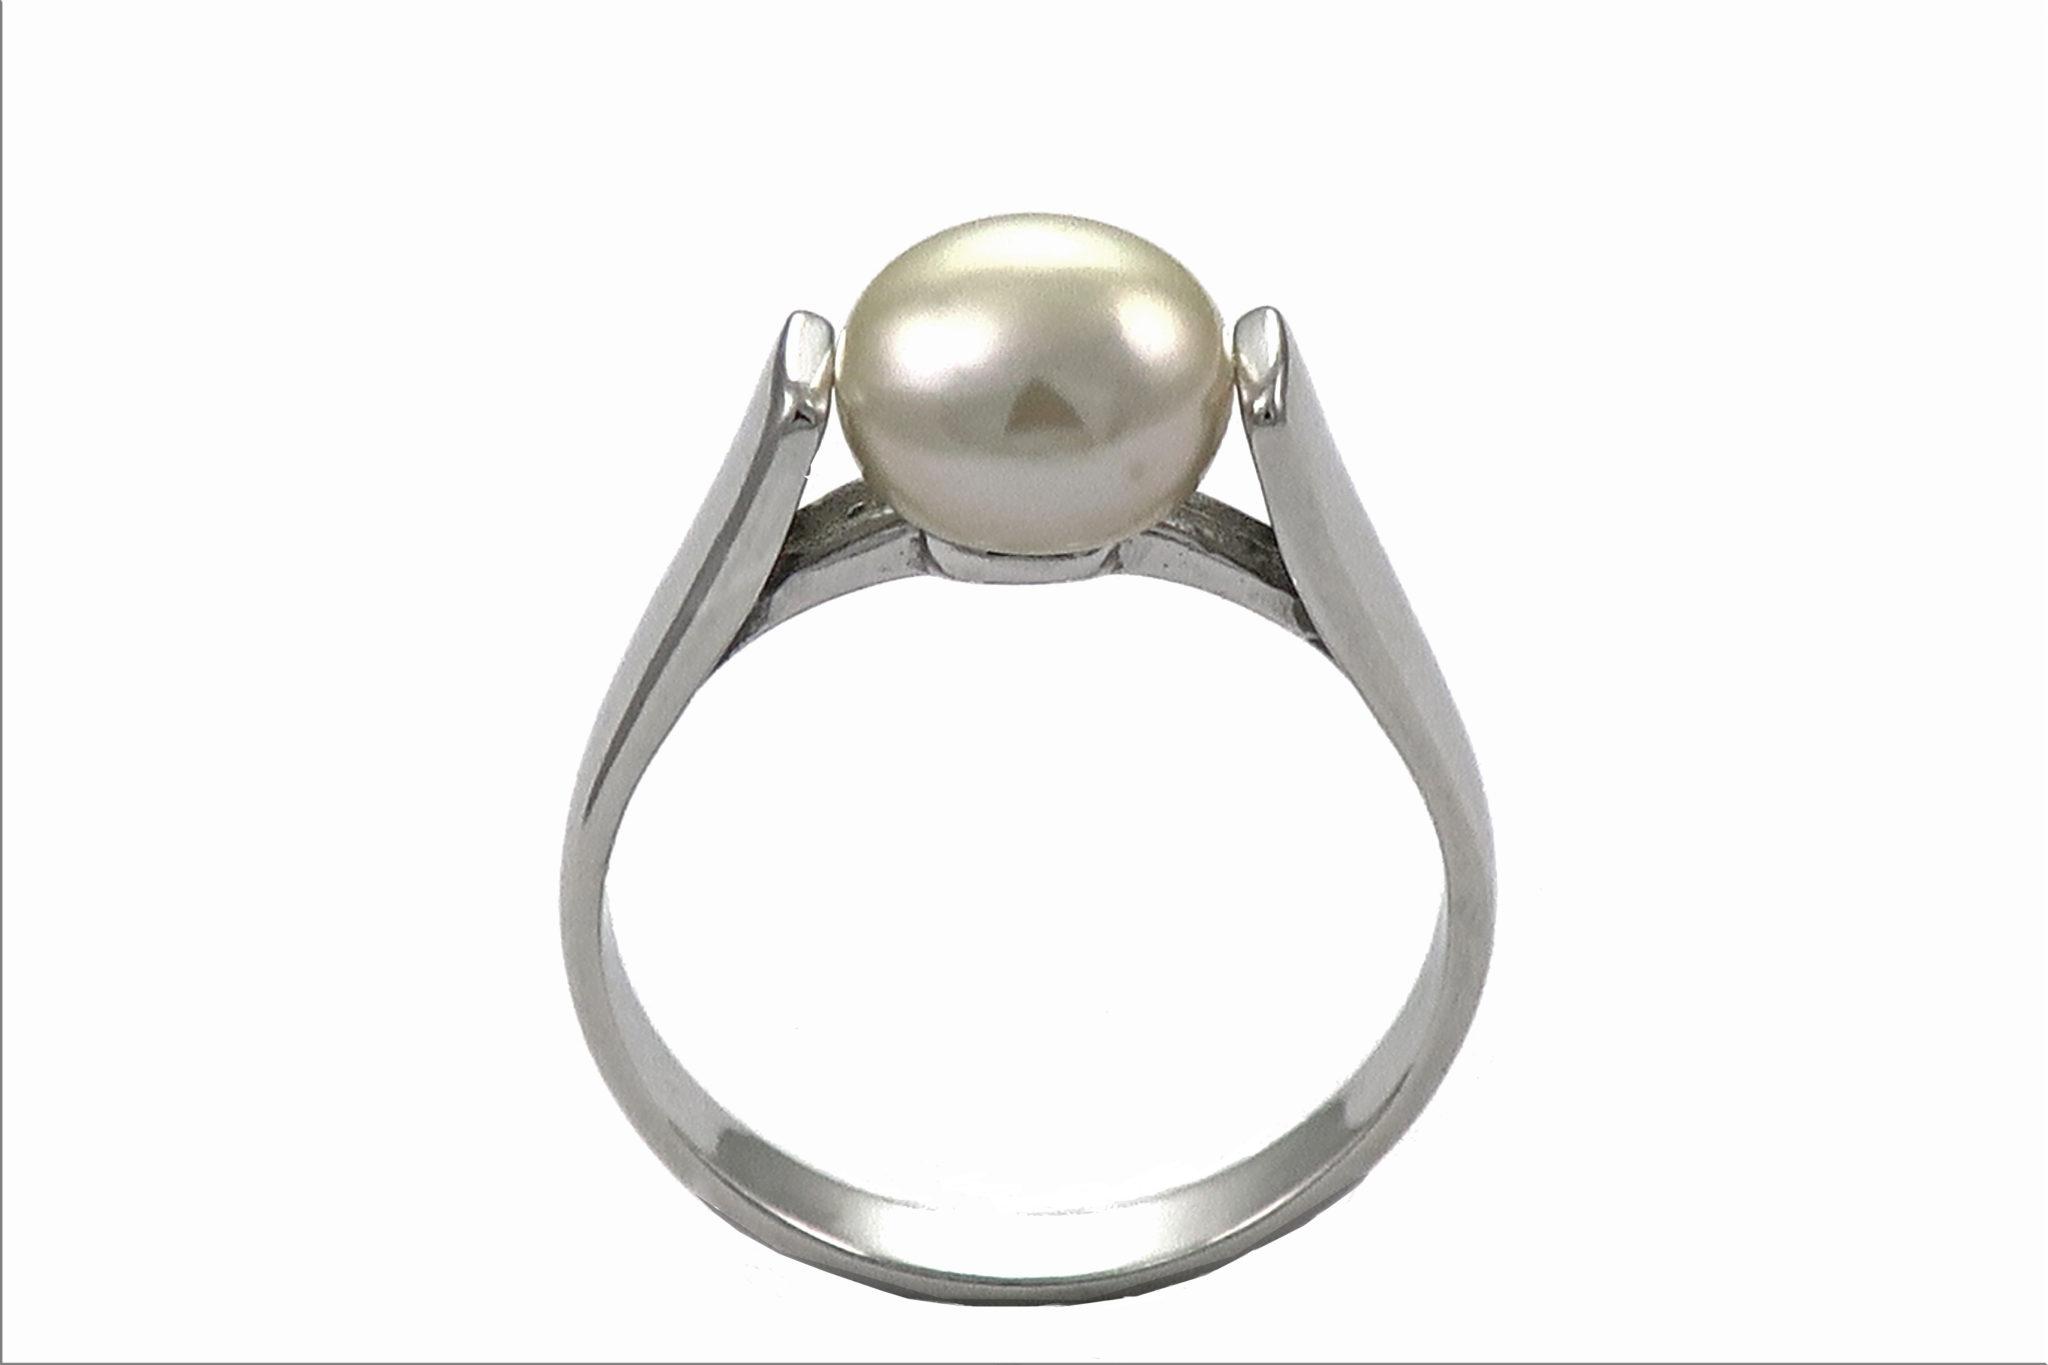 efaf38dfd Ref. 11394 Anillo plata rodiada+ perla cultivada boton 8 m/m ...